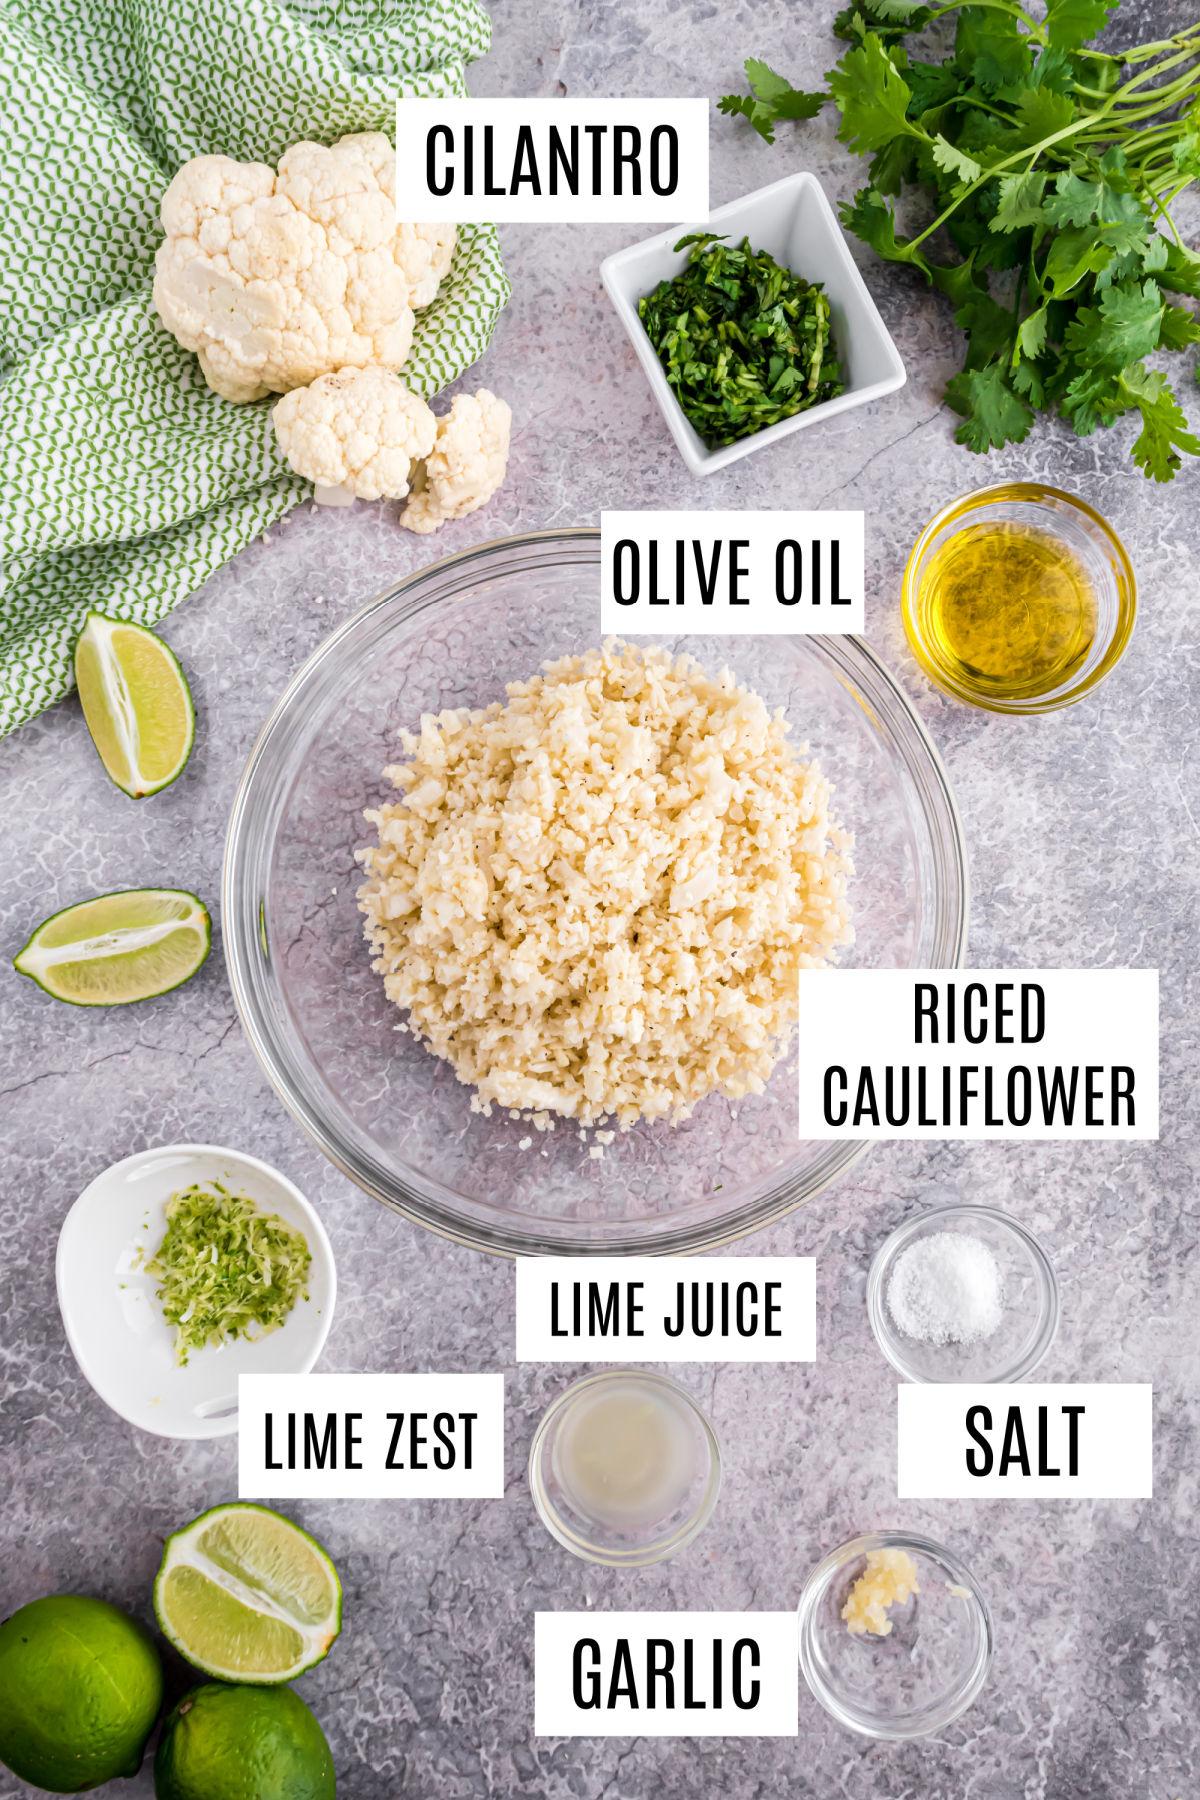 Cilantro lime cauliflower rice recipe ingredients.